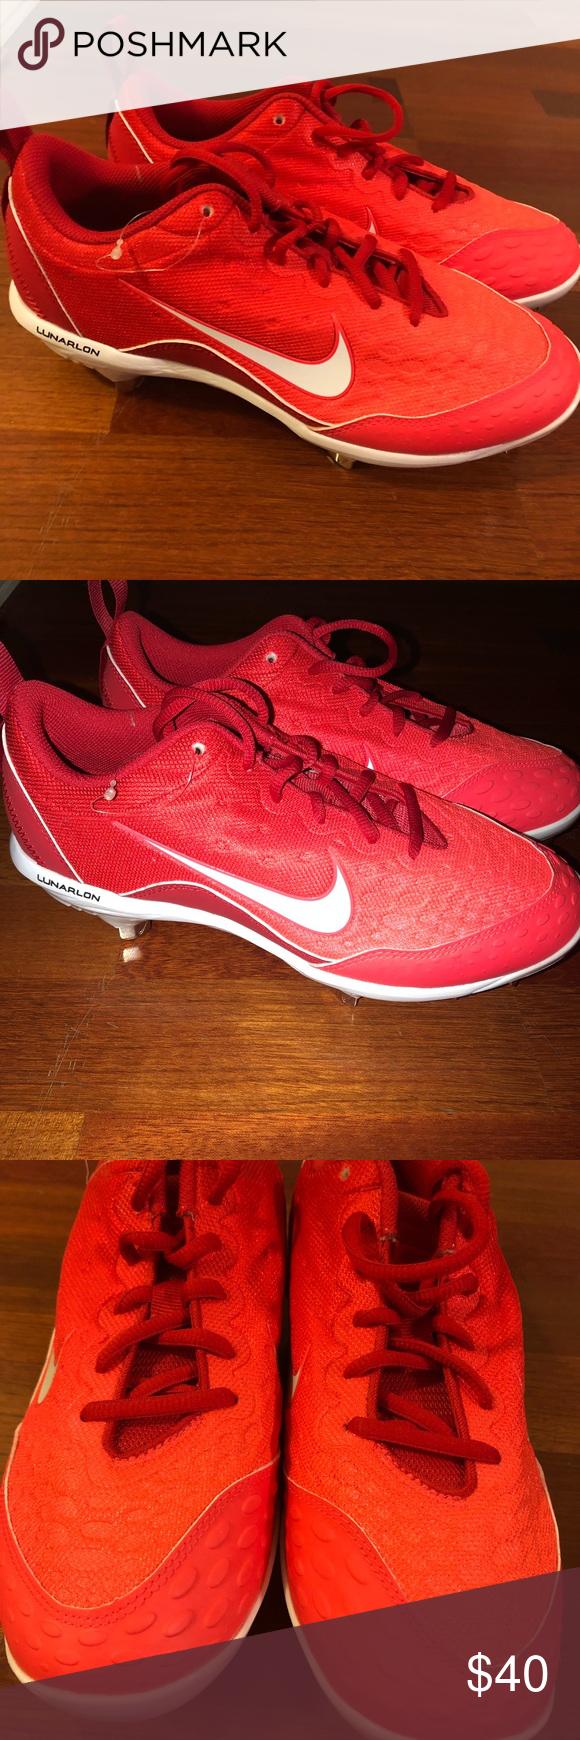 Baseball shoes, Red nike shoes, Nike